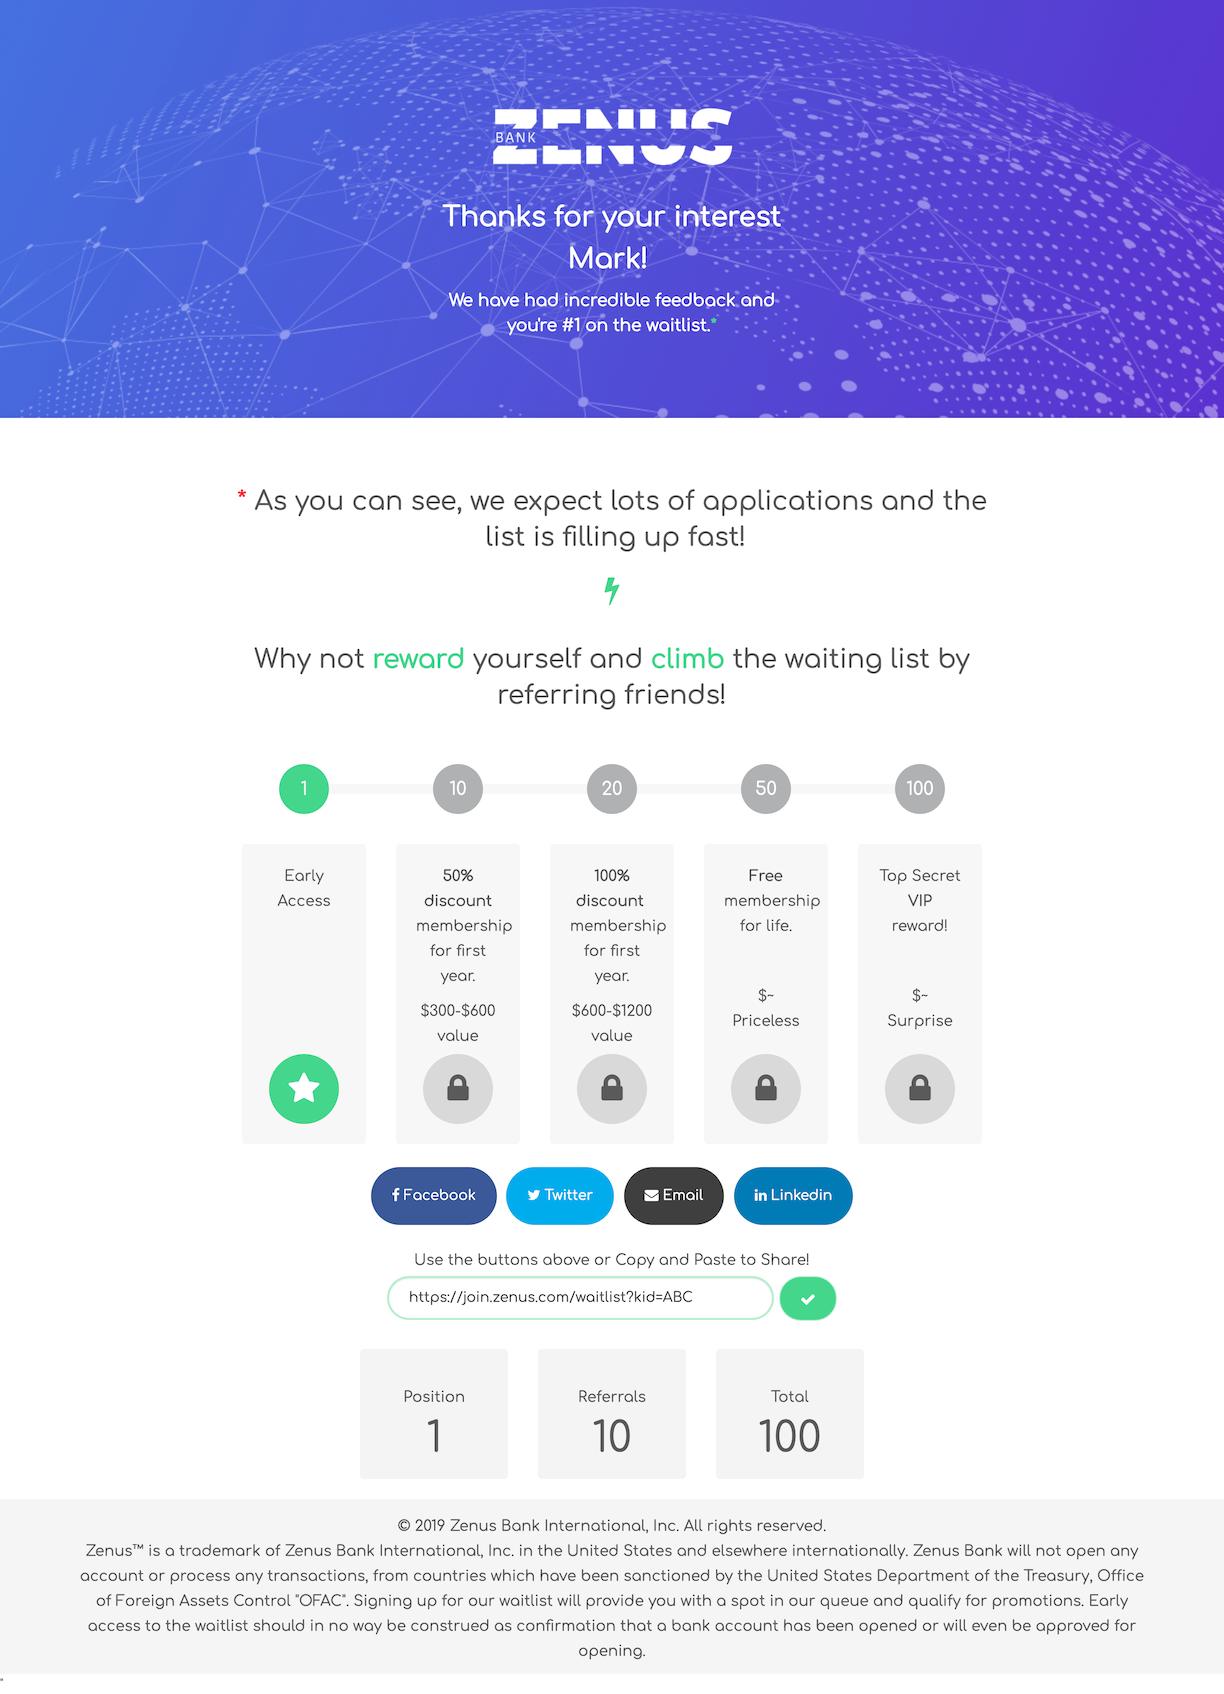 Zenus Reward Level Page to Encourage Sharing